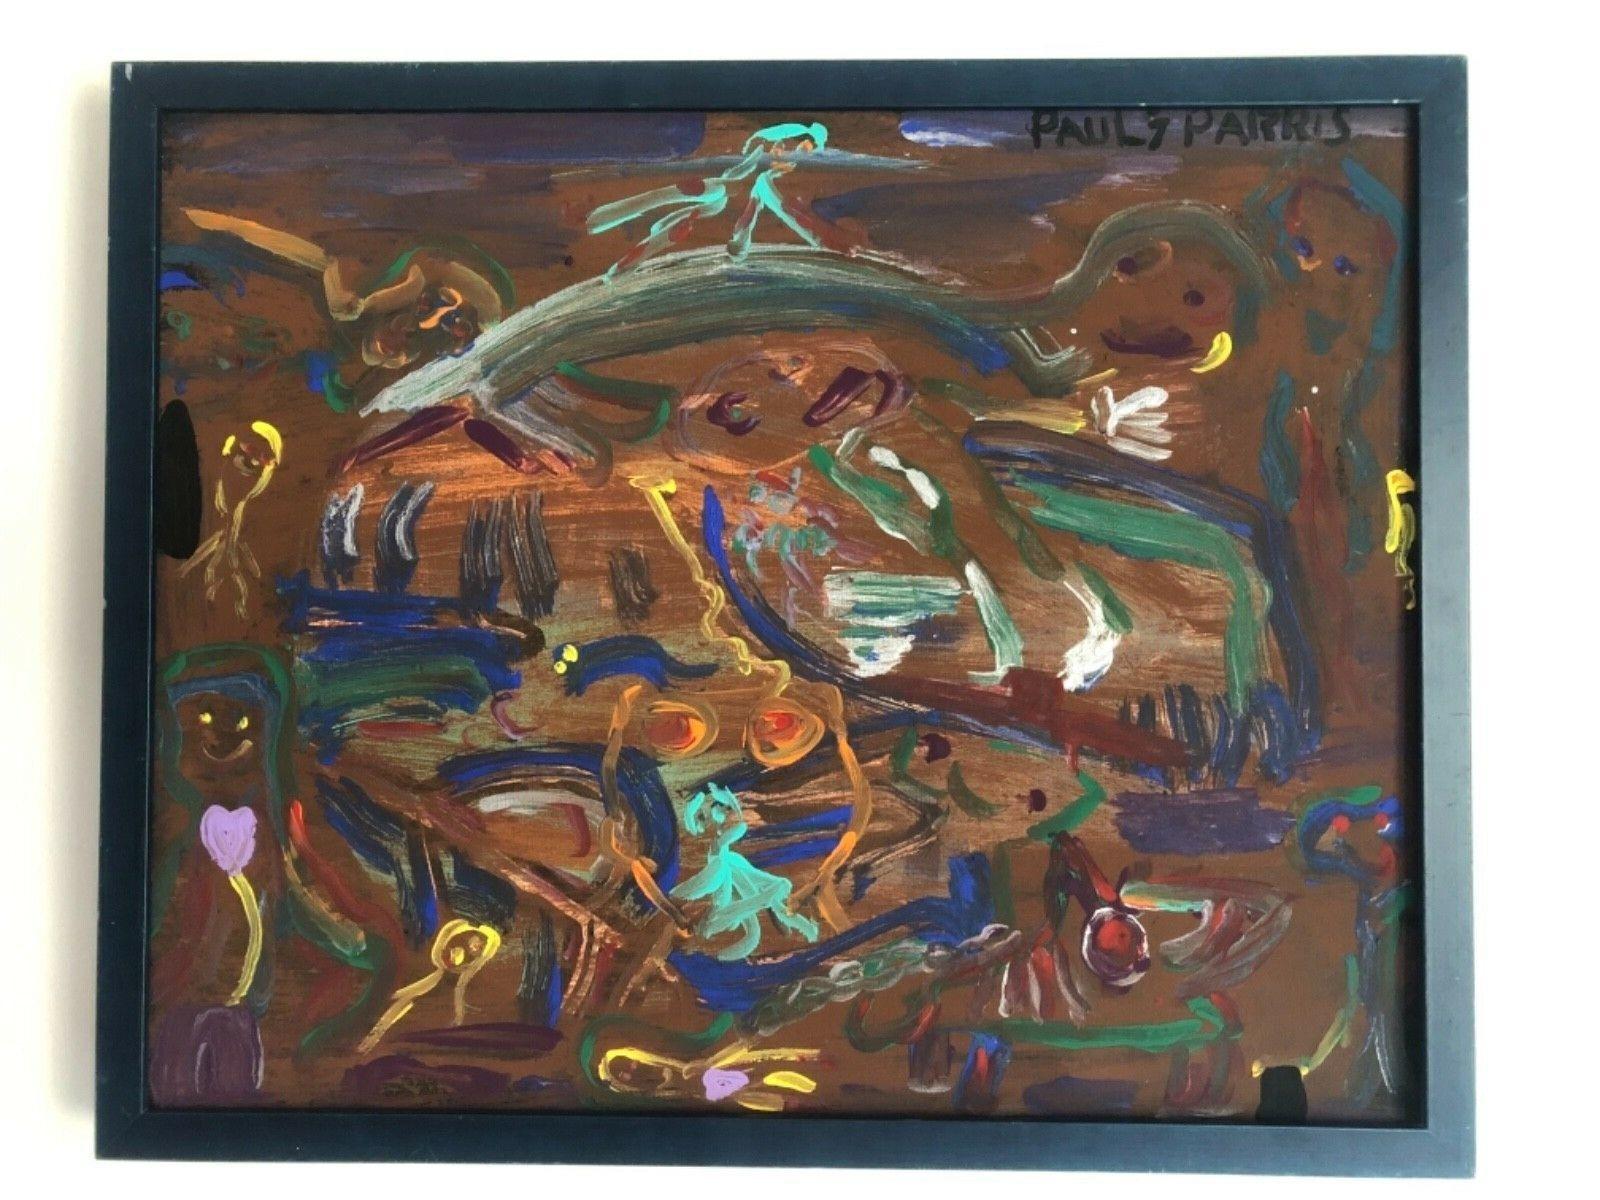 Paul Parris Outsider Art Expressionist Picasso Dali Graffiti Miro Chagall Keil - $49.00